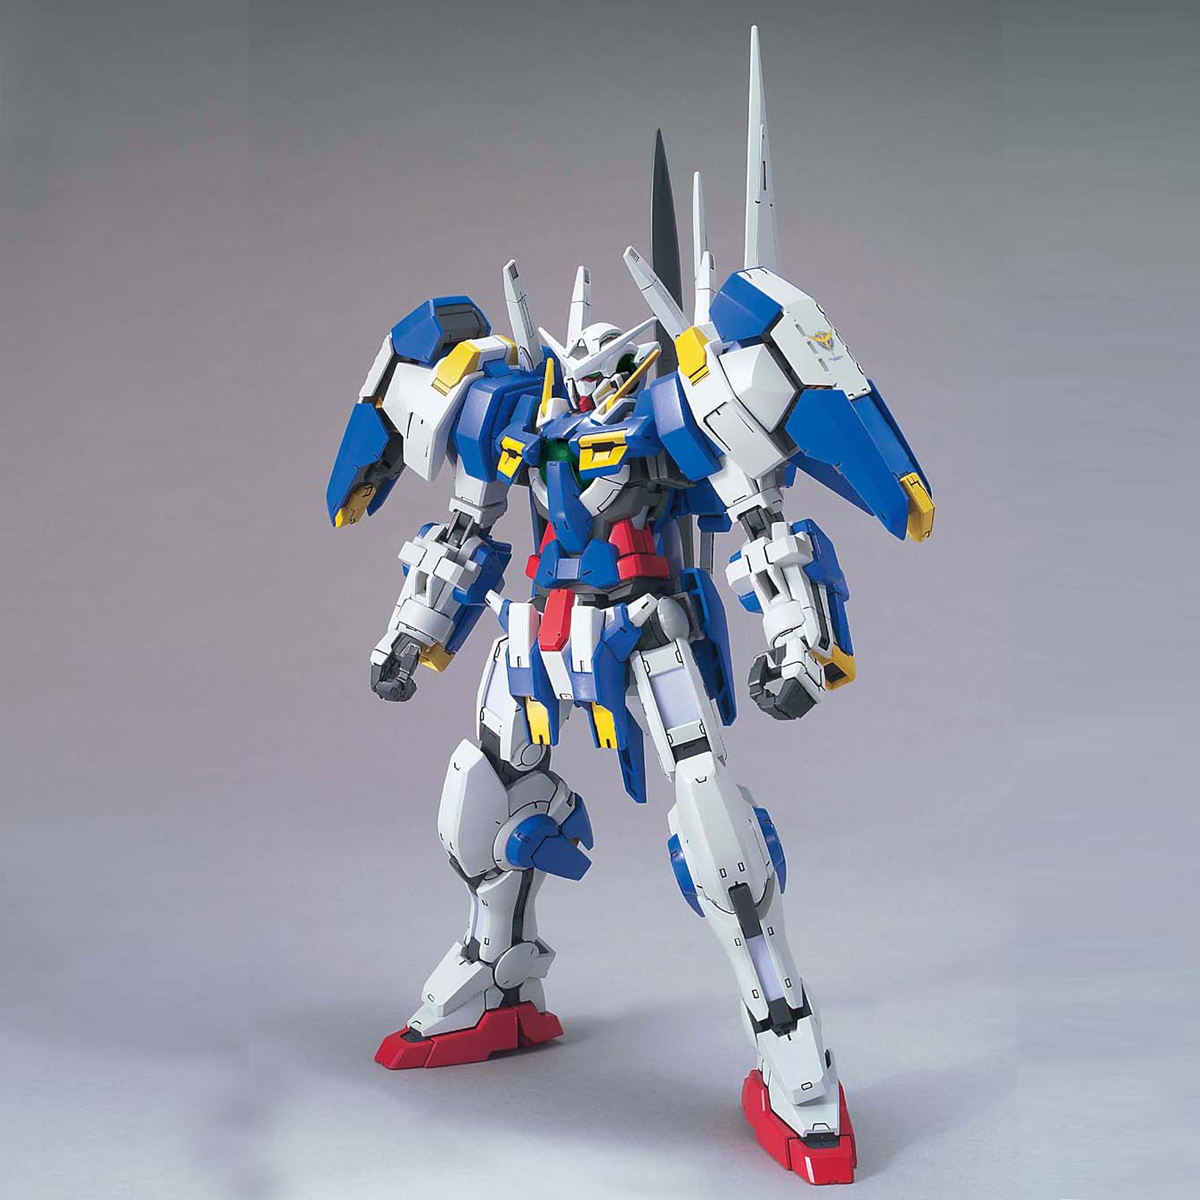 889601/100 GN-001/hs-A01 ガンダムアヴァランチエクシア [Gundam Avalanche Exia]